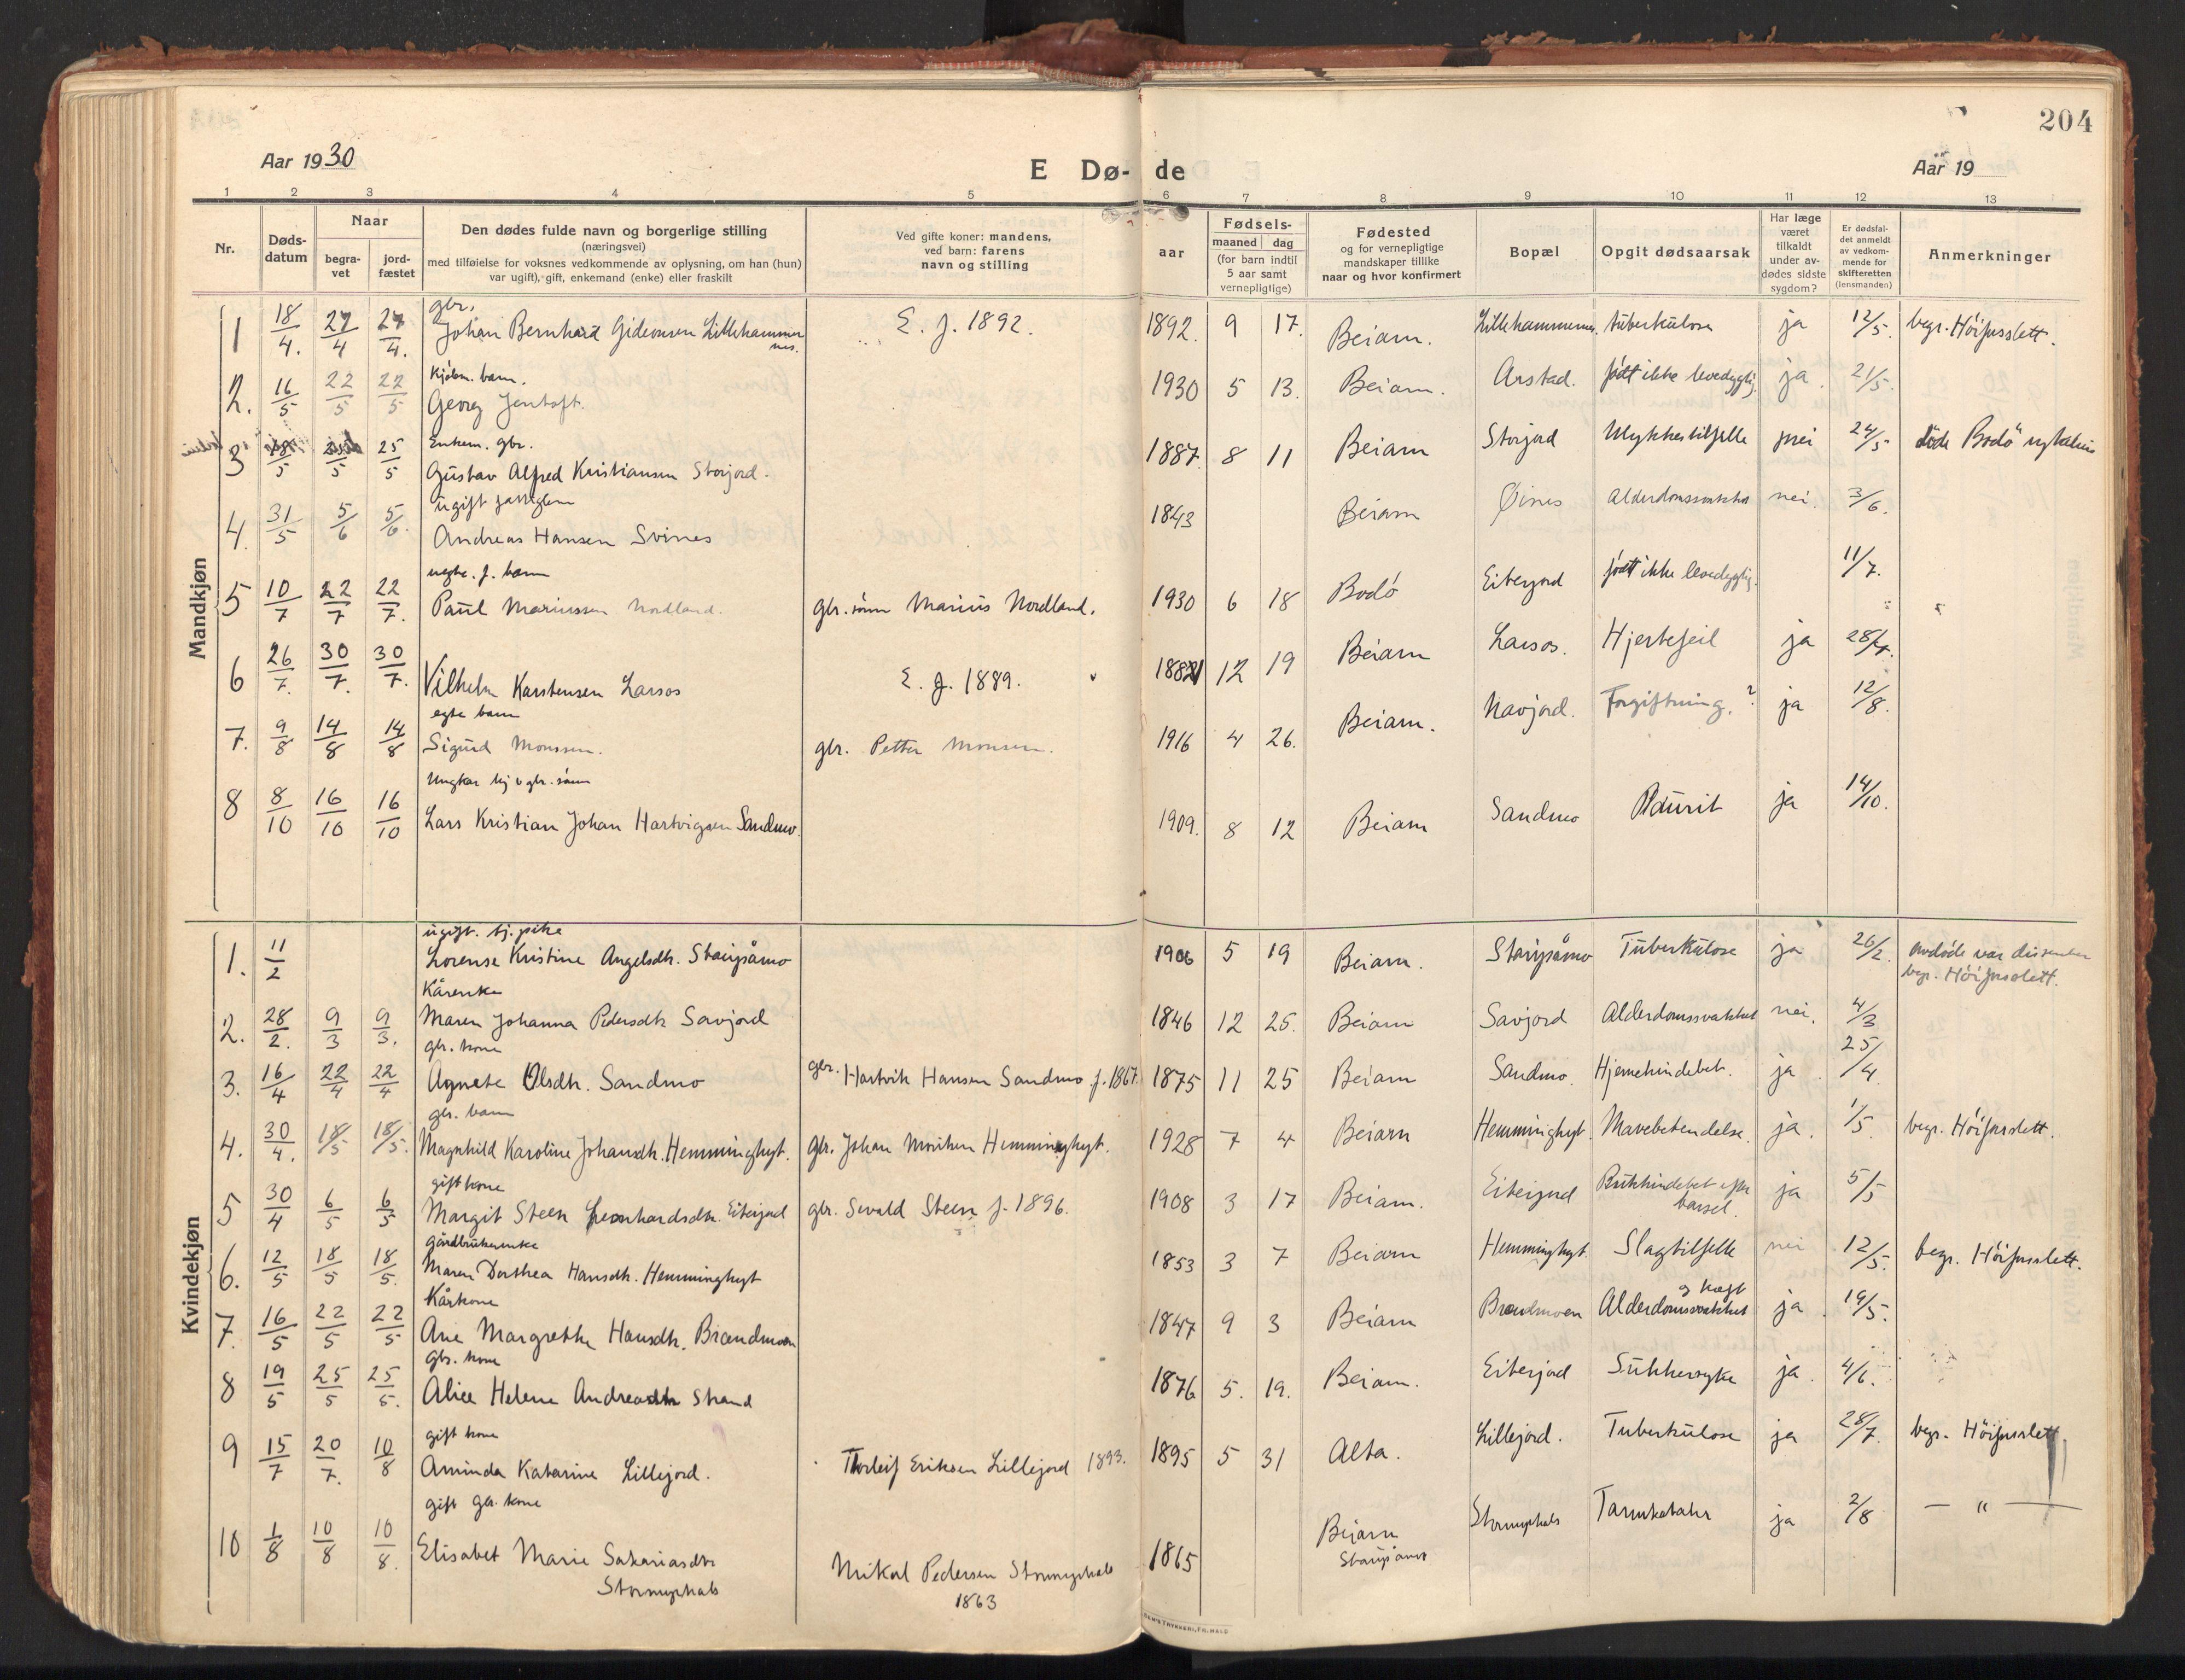 SAT, Ministerialprotokoller, klokkerbøker og fødselsregistre - Nordland, 846/L0650: Ministerialbok nr. 846A08, 1916-1935, s. 204